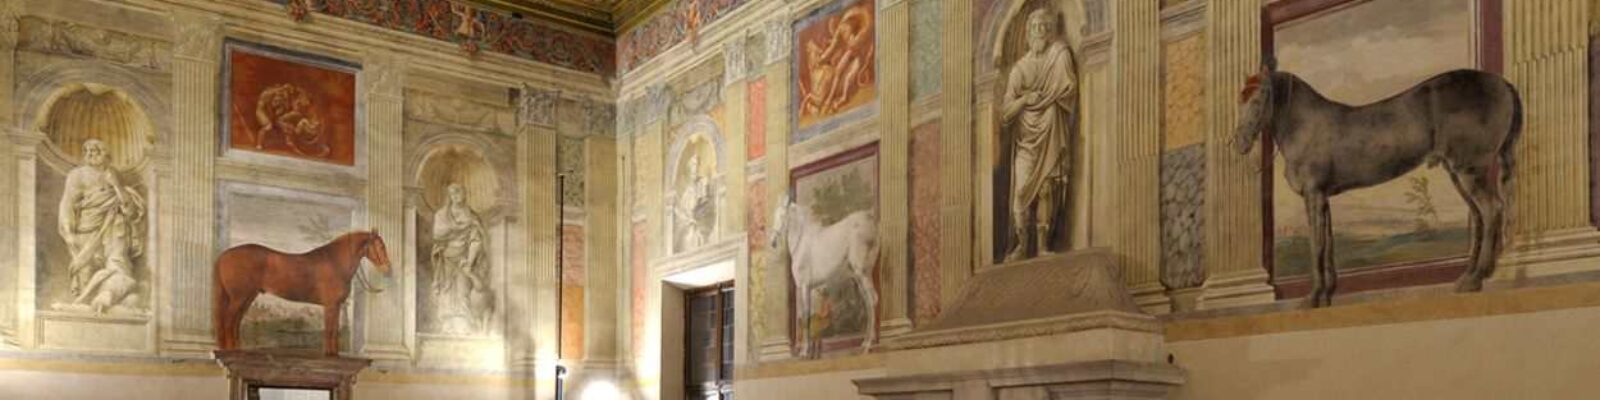 Mantova Te Palace Civic Museum sala dei cavalli illuminata - illuminazione musei